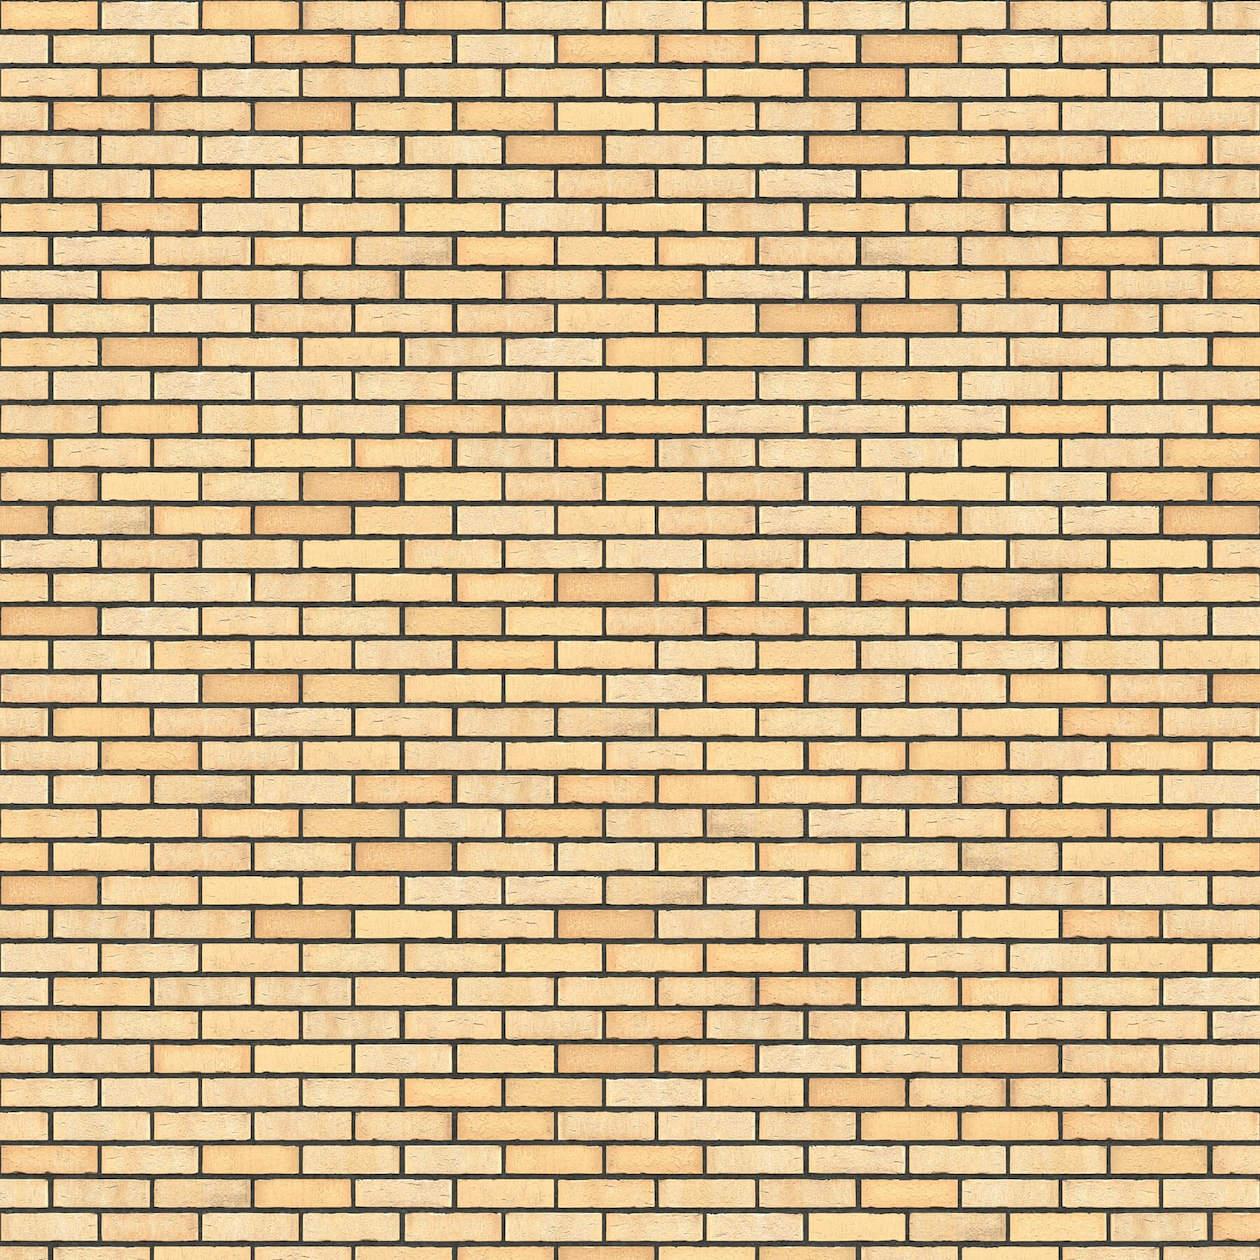 Puna-cigla-FeldHaus-Klinker-brick-house-Beograd-nf-k-724-Antracit Fuga